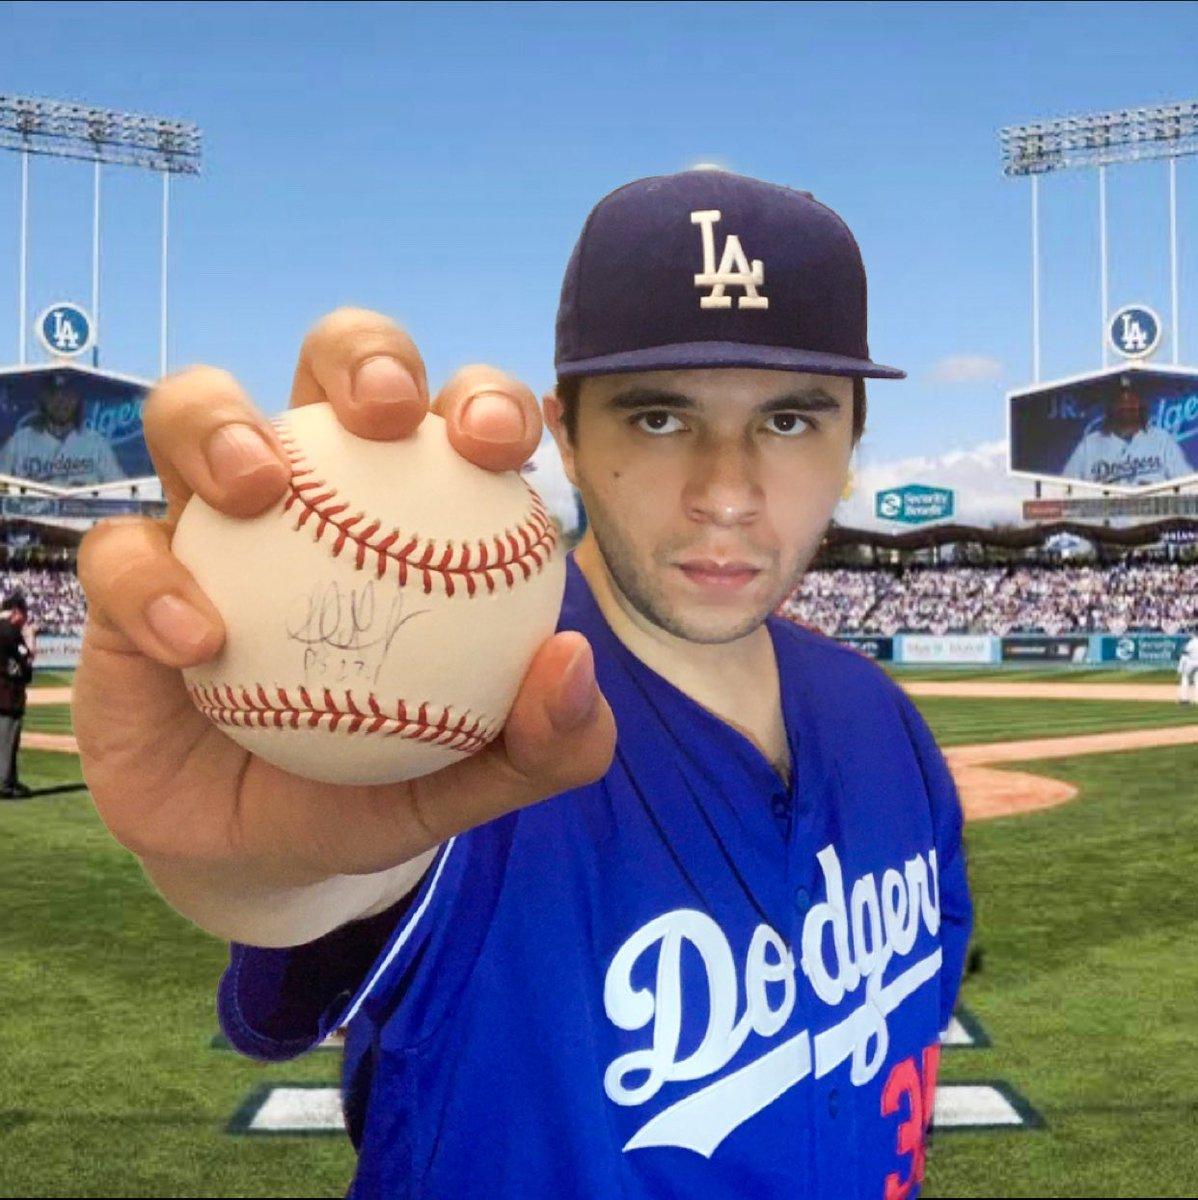 SOY ⚾️DODGER⚾️ DE CORAZÓN ⚾️🏆SOMOS CAMPEONES DE LA SERIE MUNDIAL VOS⚾️🏆!!!!! #losdodgers #seriemundial #baseball #la #losangeles #dodgers #howeverandever #model #dodgersbaseball #dodgerstadium #seriemundialdebeisbol #worldchampions #worldchampionship #salvadoreño #dodgersfan https://t.co/S7SfMzpHwc